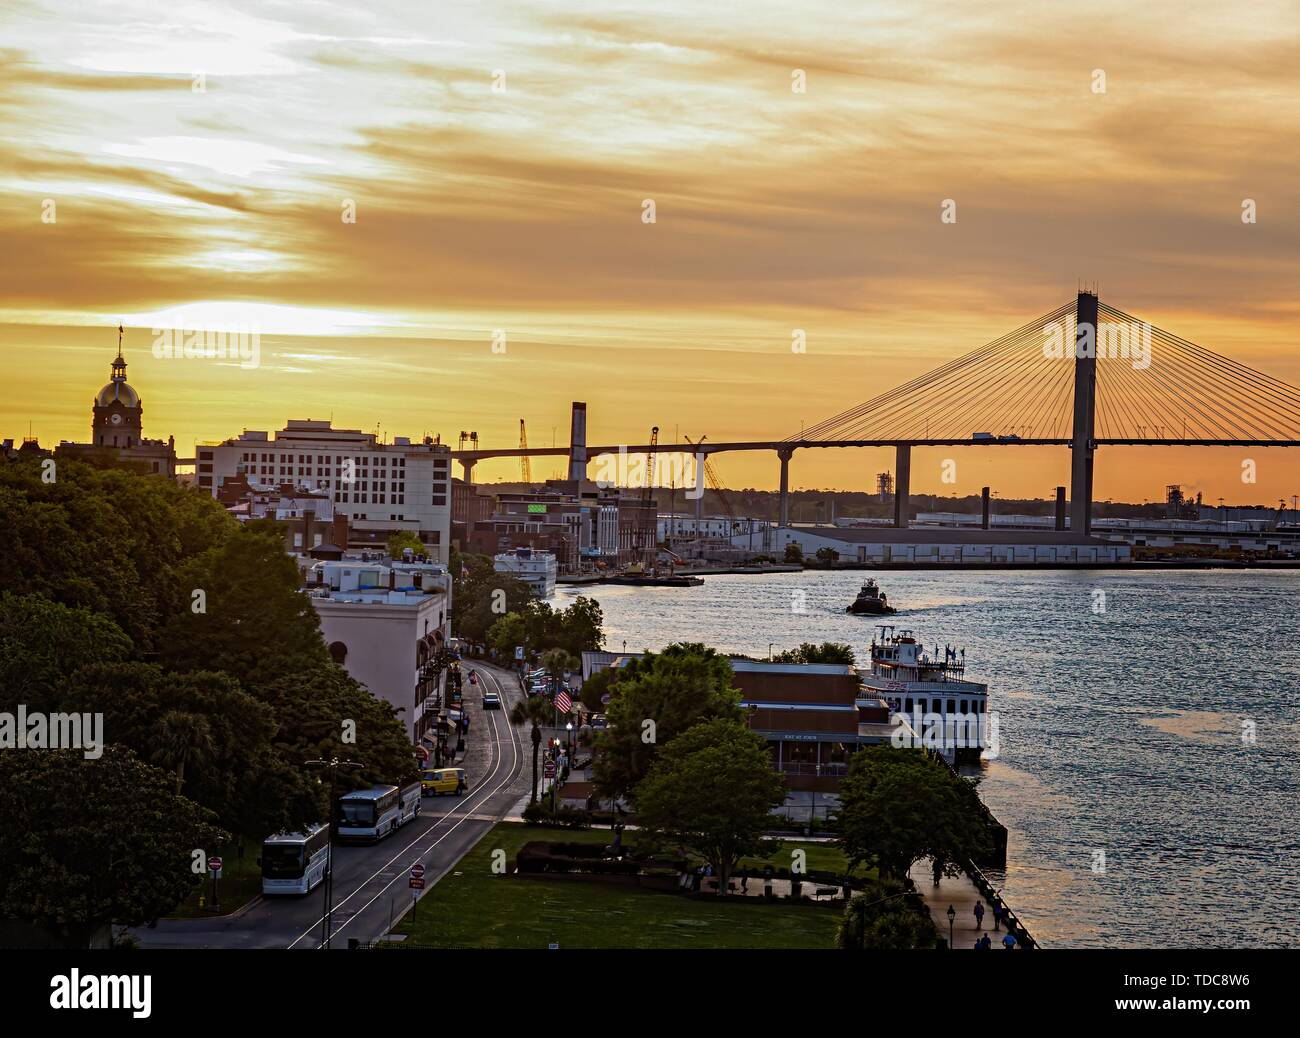 The Sydney Lanier Bridge across the Savannah River - Stock Image